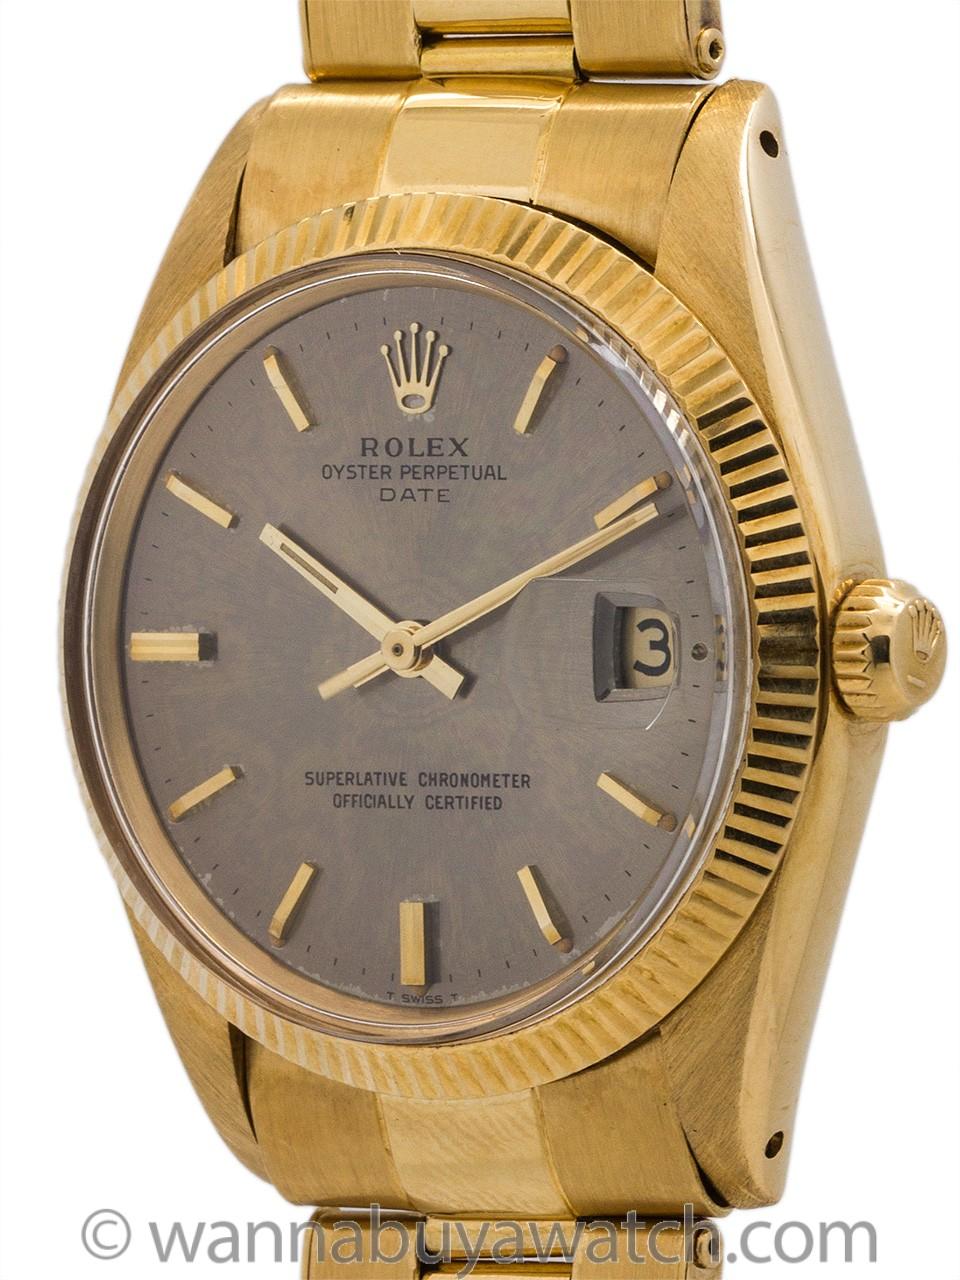 Rolex 18K YG Oyster Perpetual Date ref 1503 circa 1967